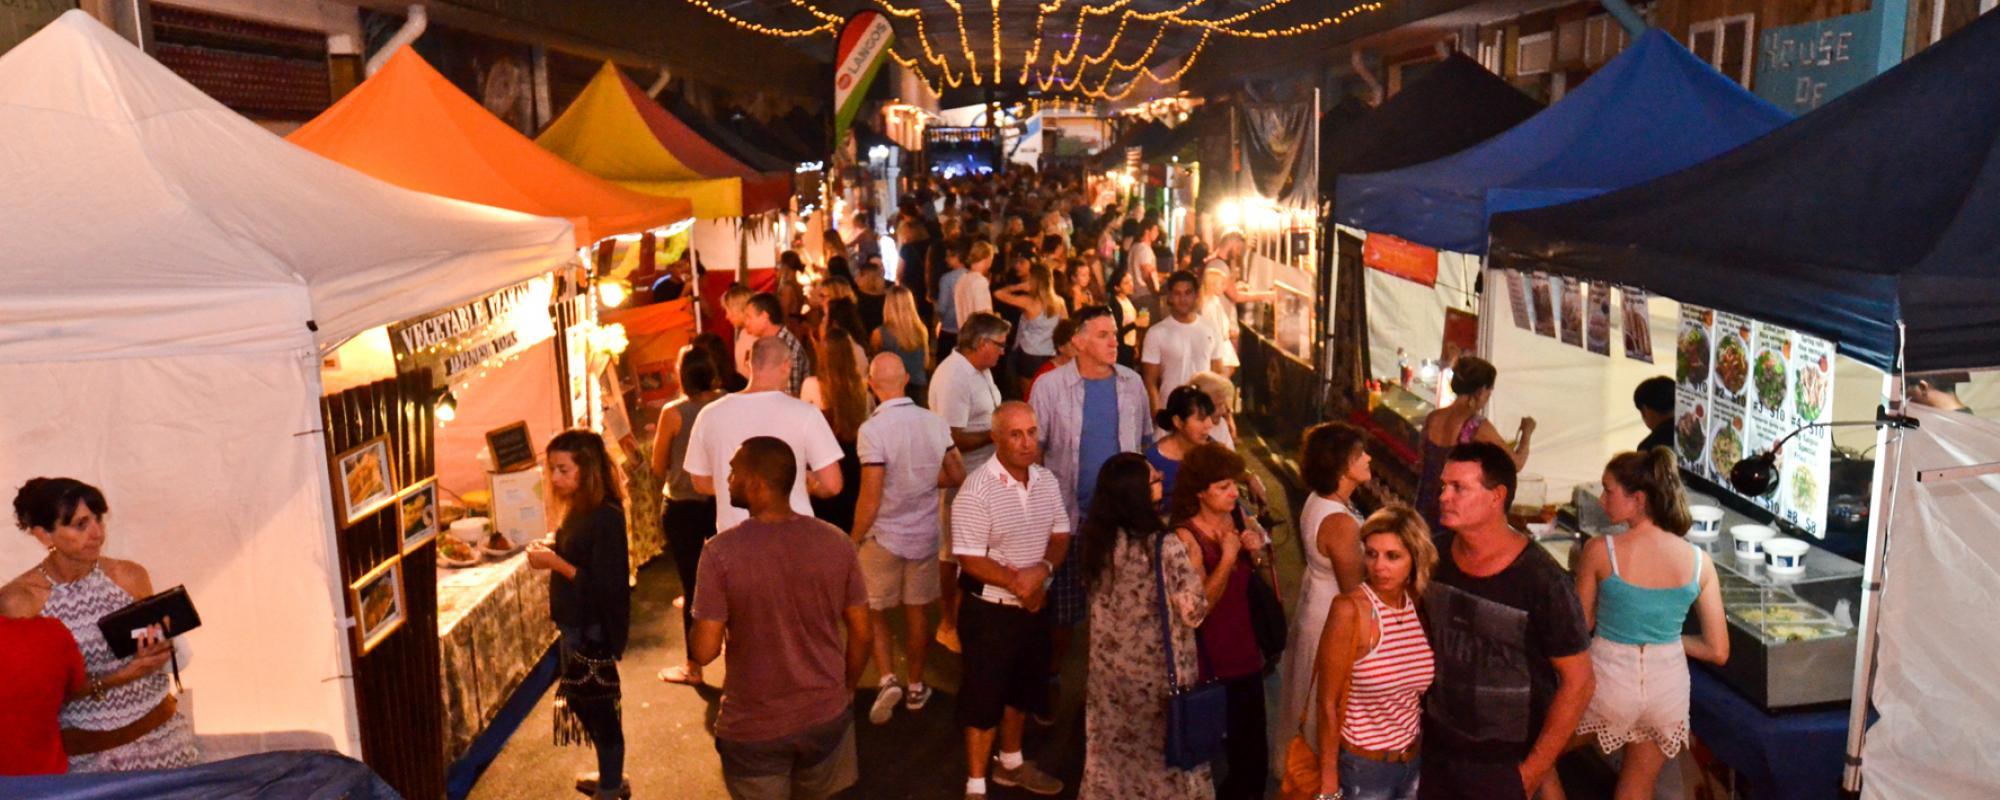 Miami Marketta Street Food and live music